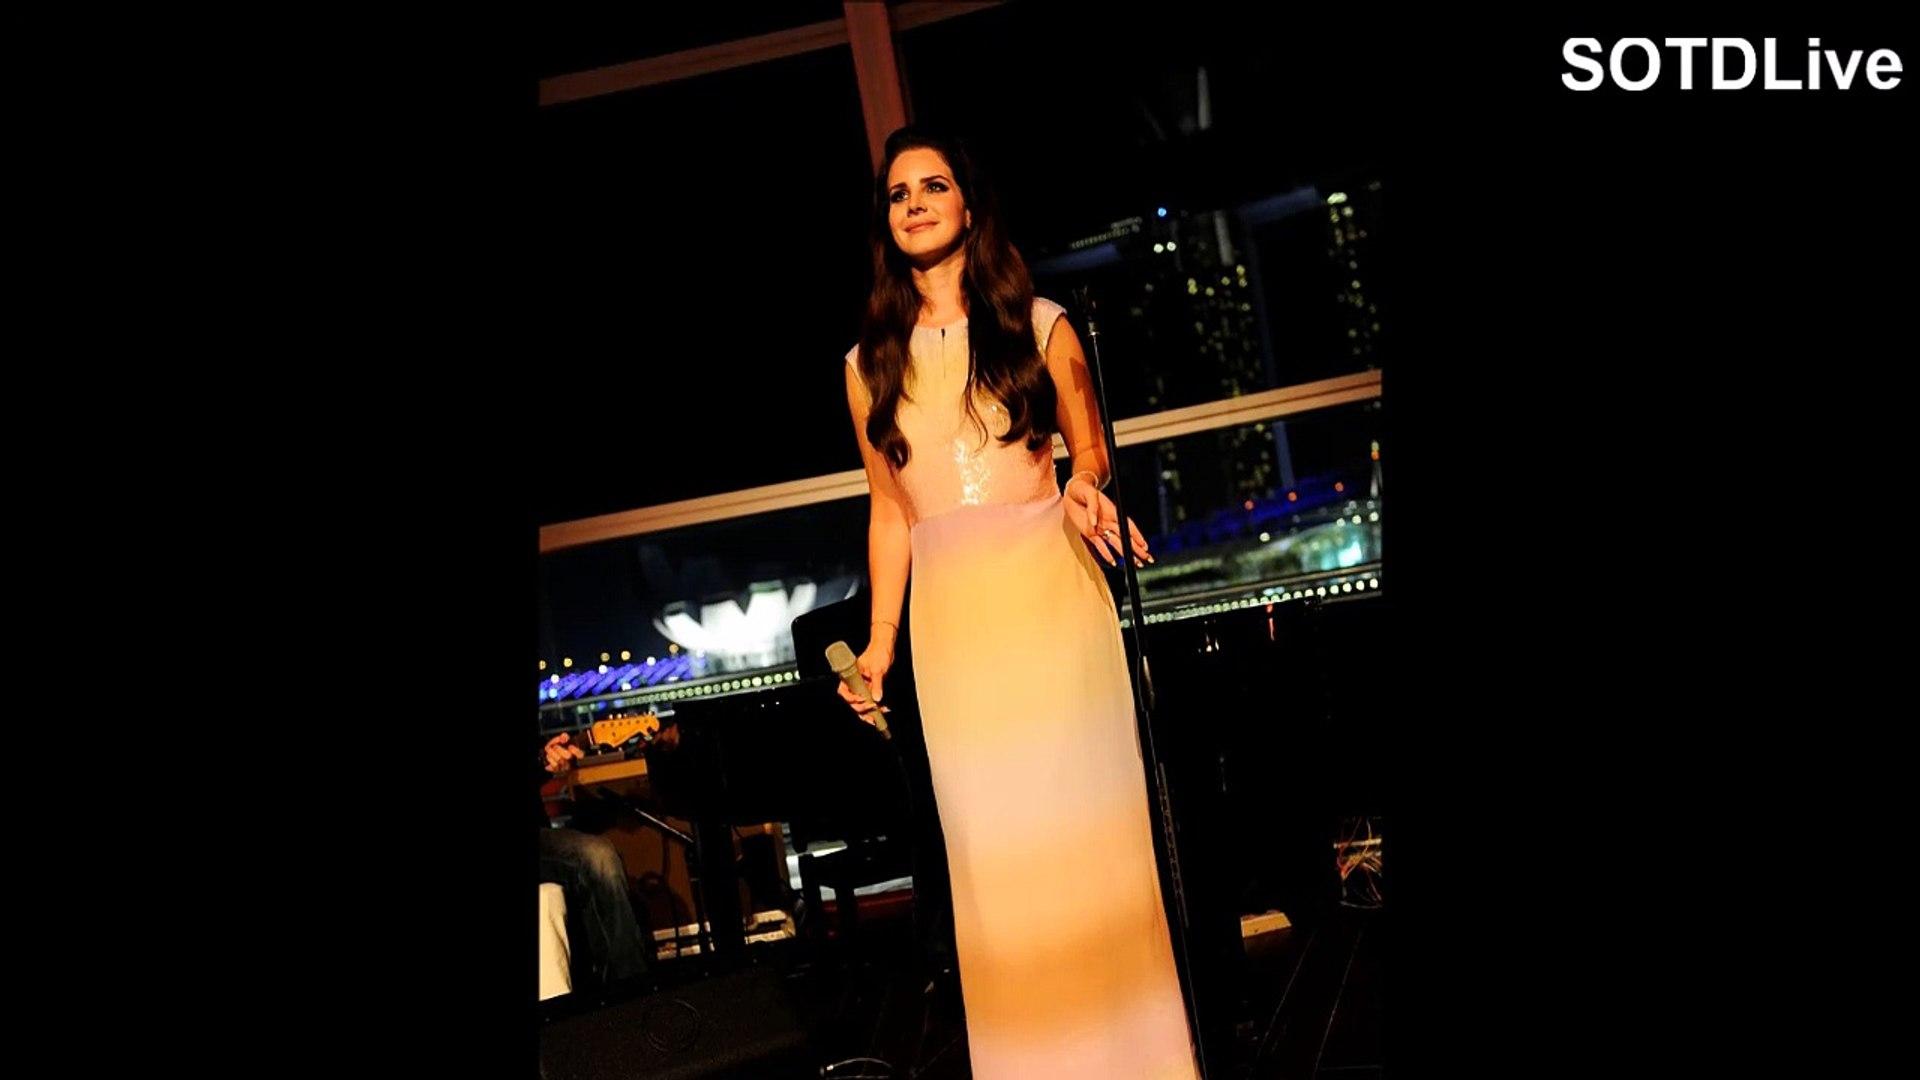 LANA DEL REY looks RAVISHING in ORANGE DRESS | SOTDLive | Episode 4